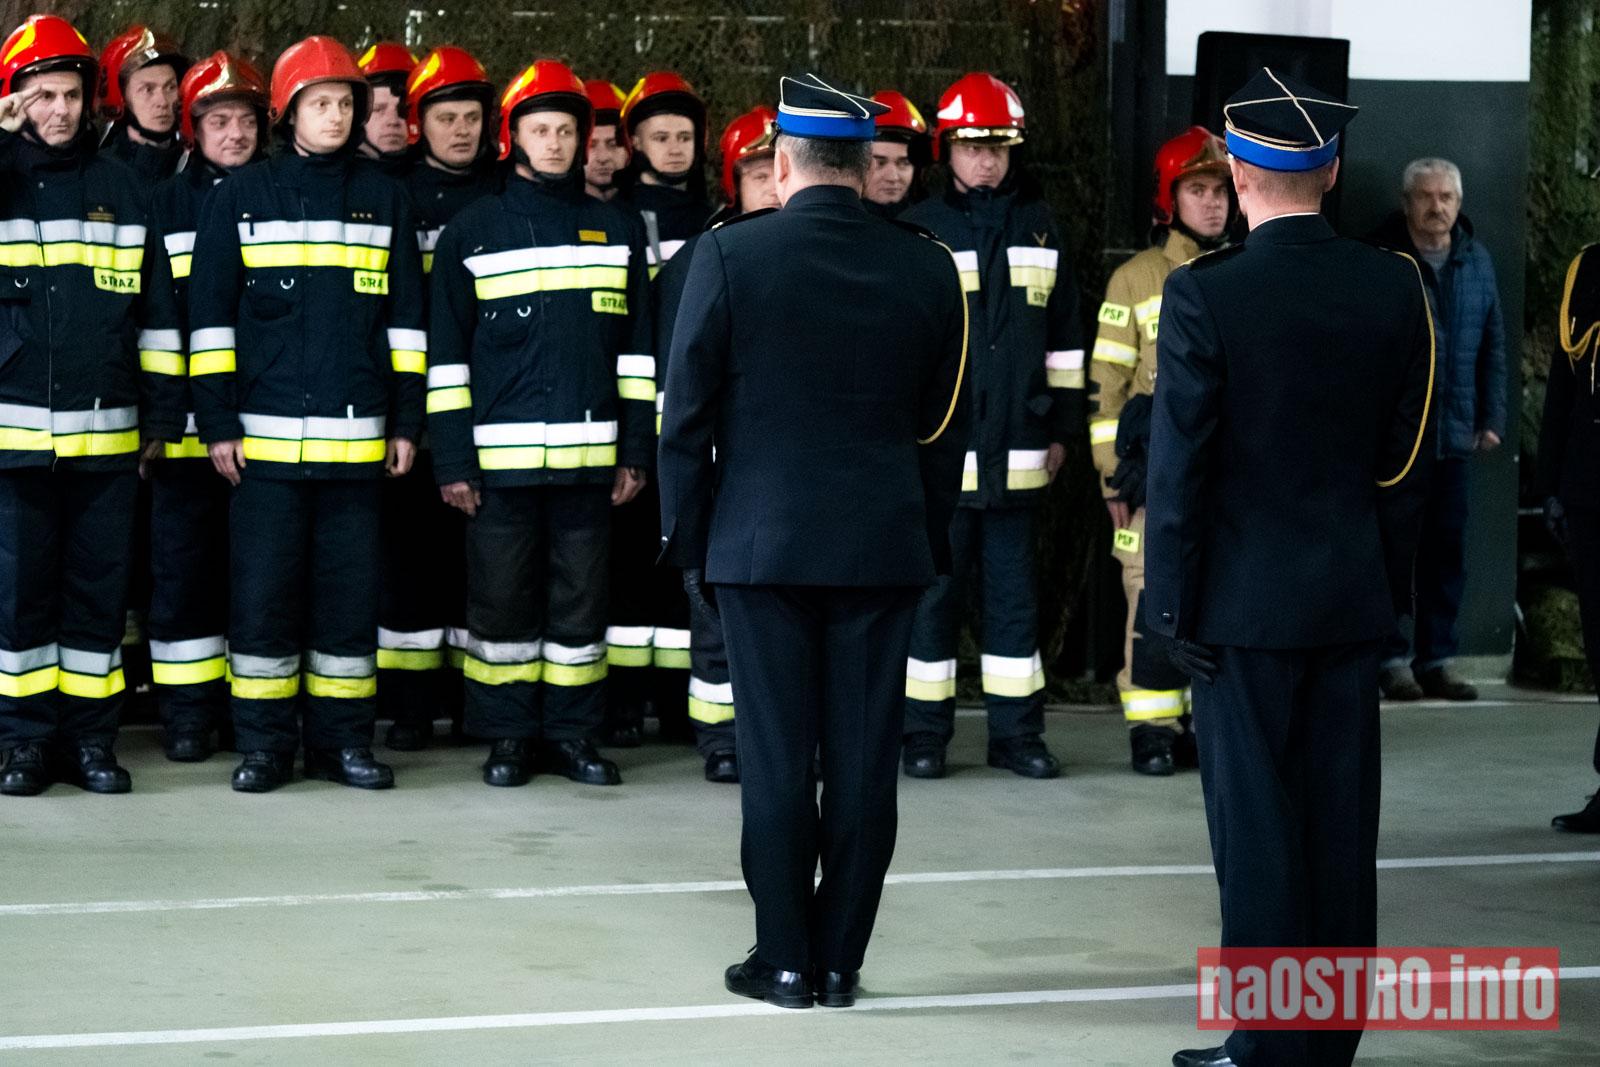 NaOSTRO dzień strażaka-9